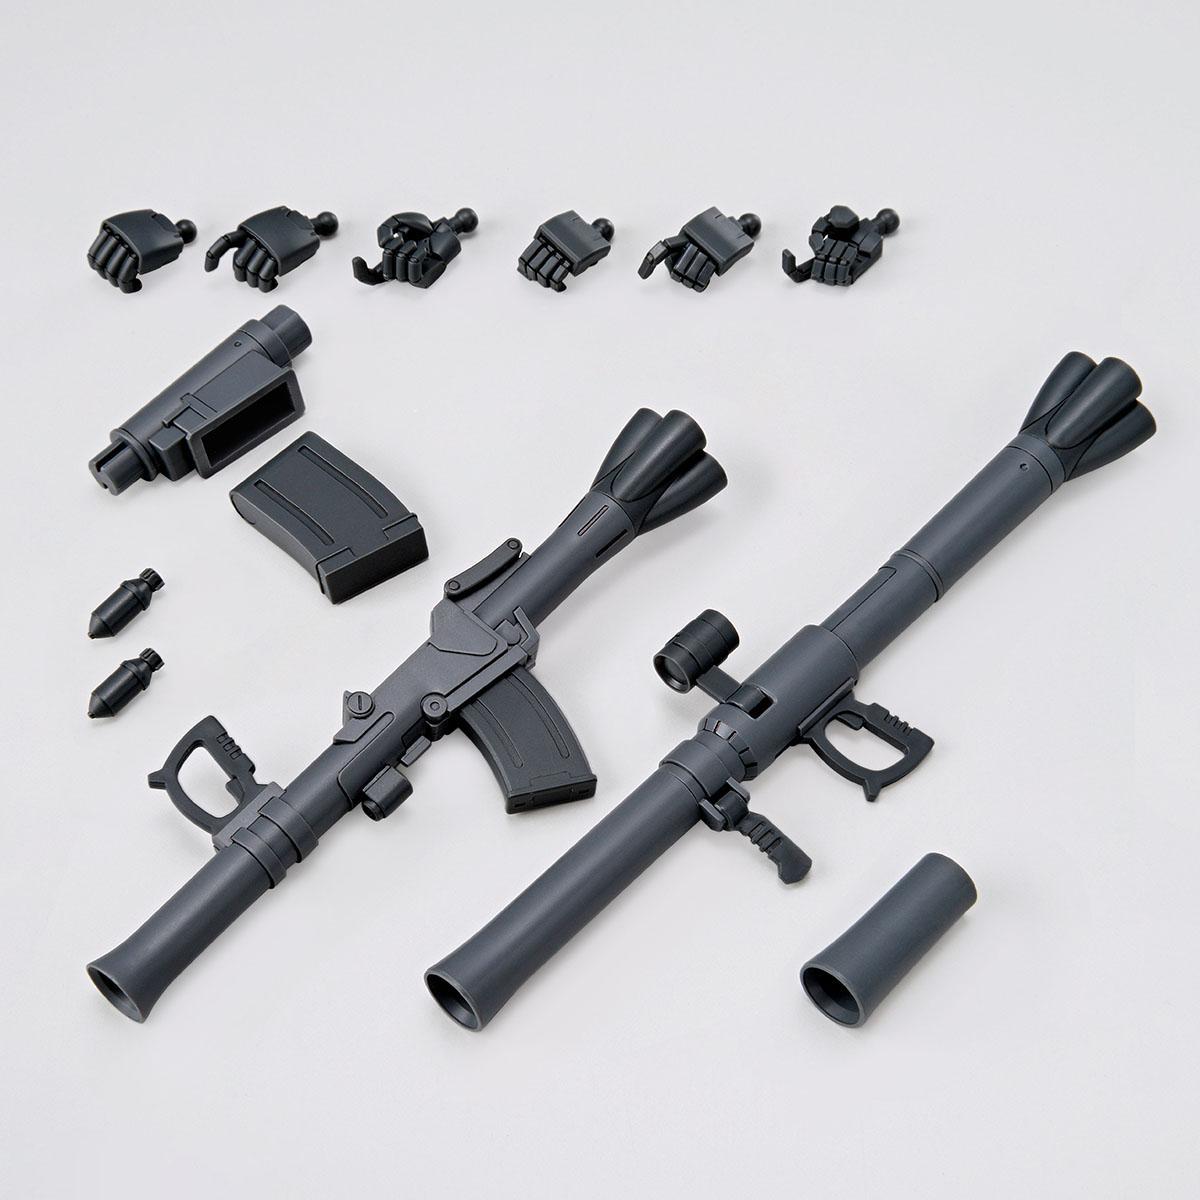 1/144 THE GUNDAM BASE LIMITED SYSTEM WEAPON KIT 009